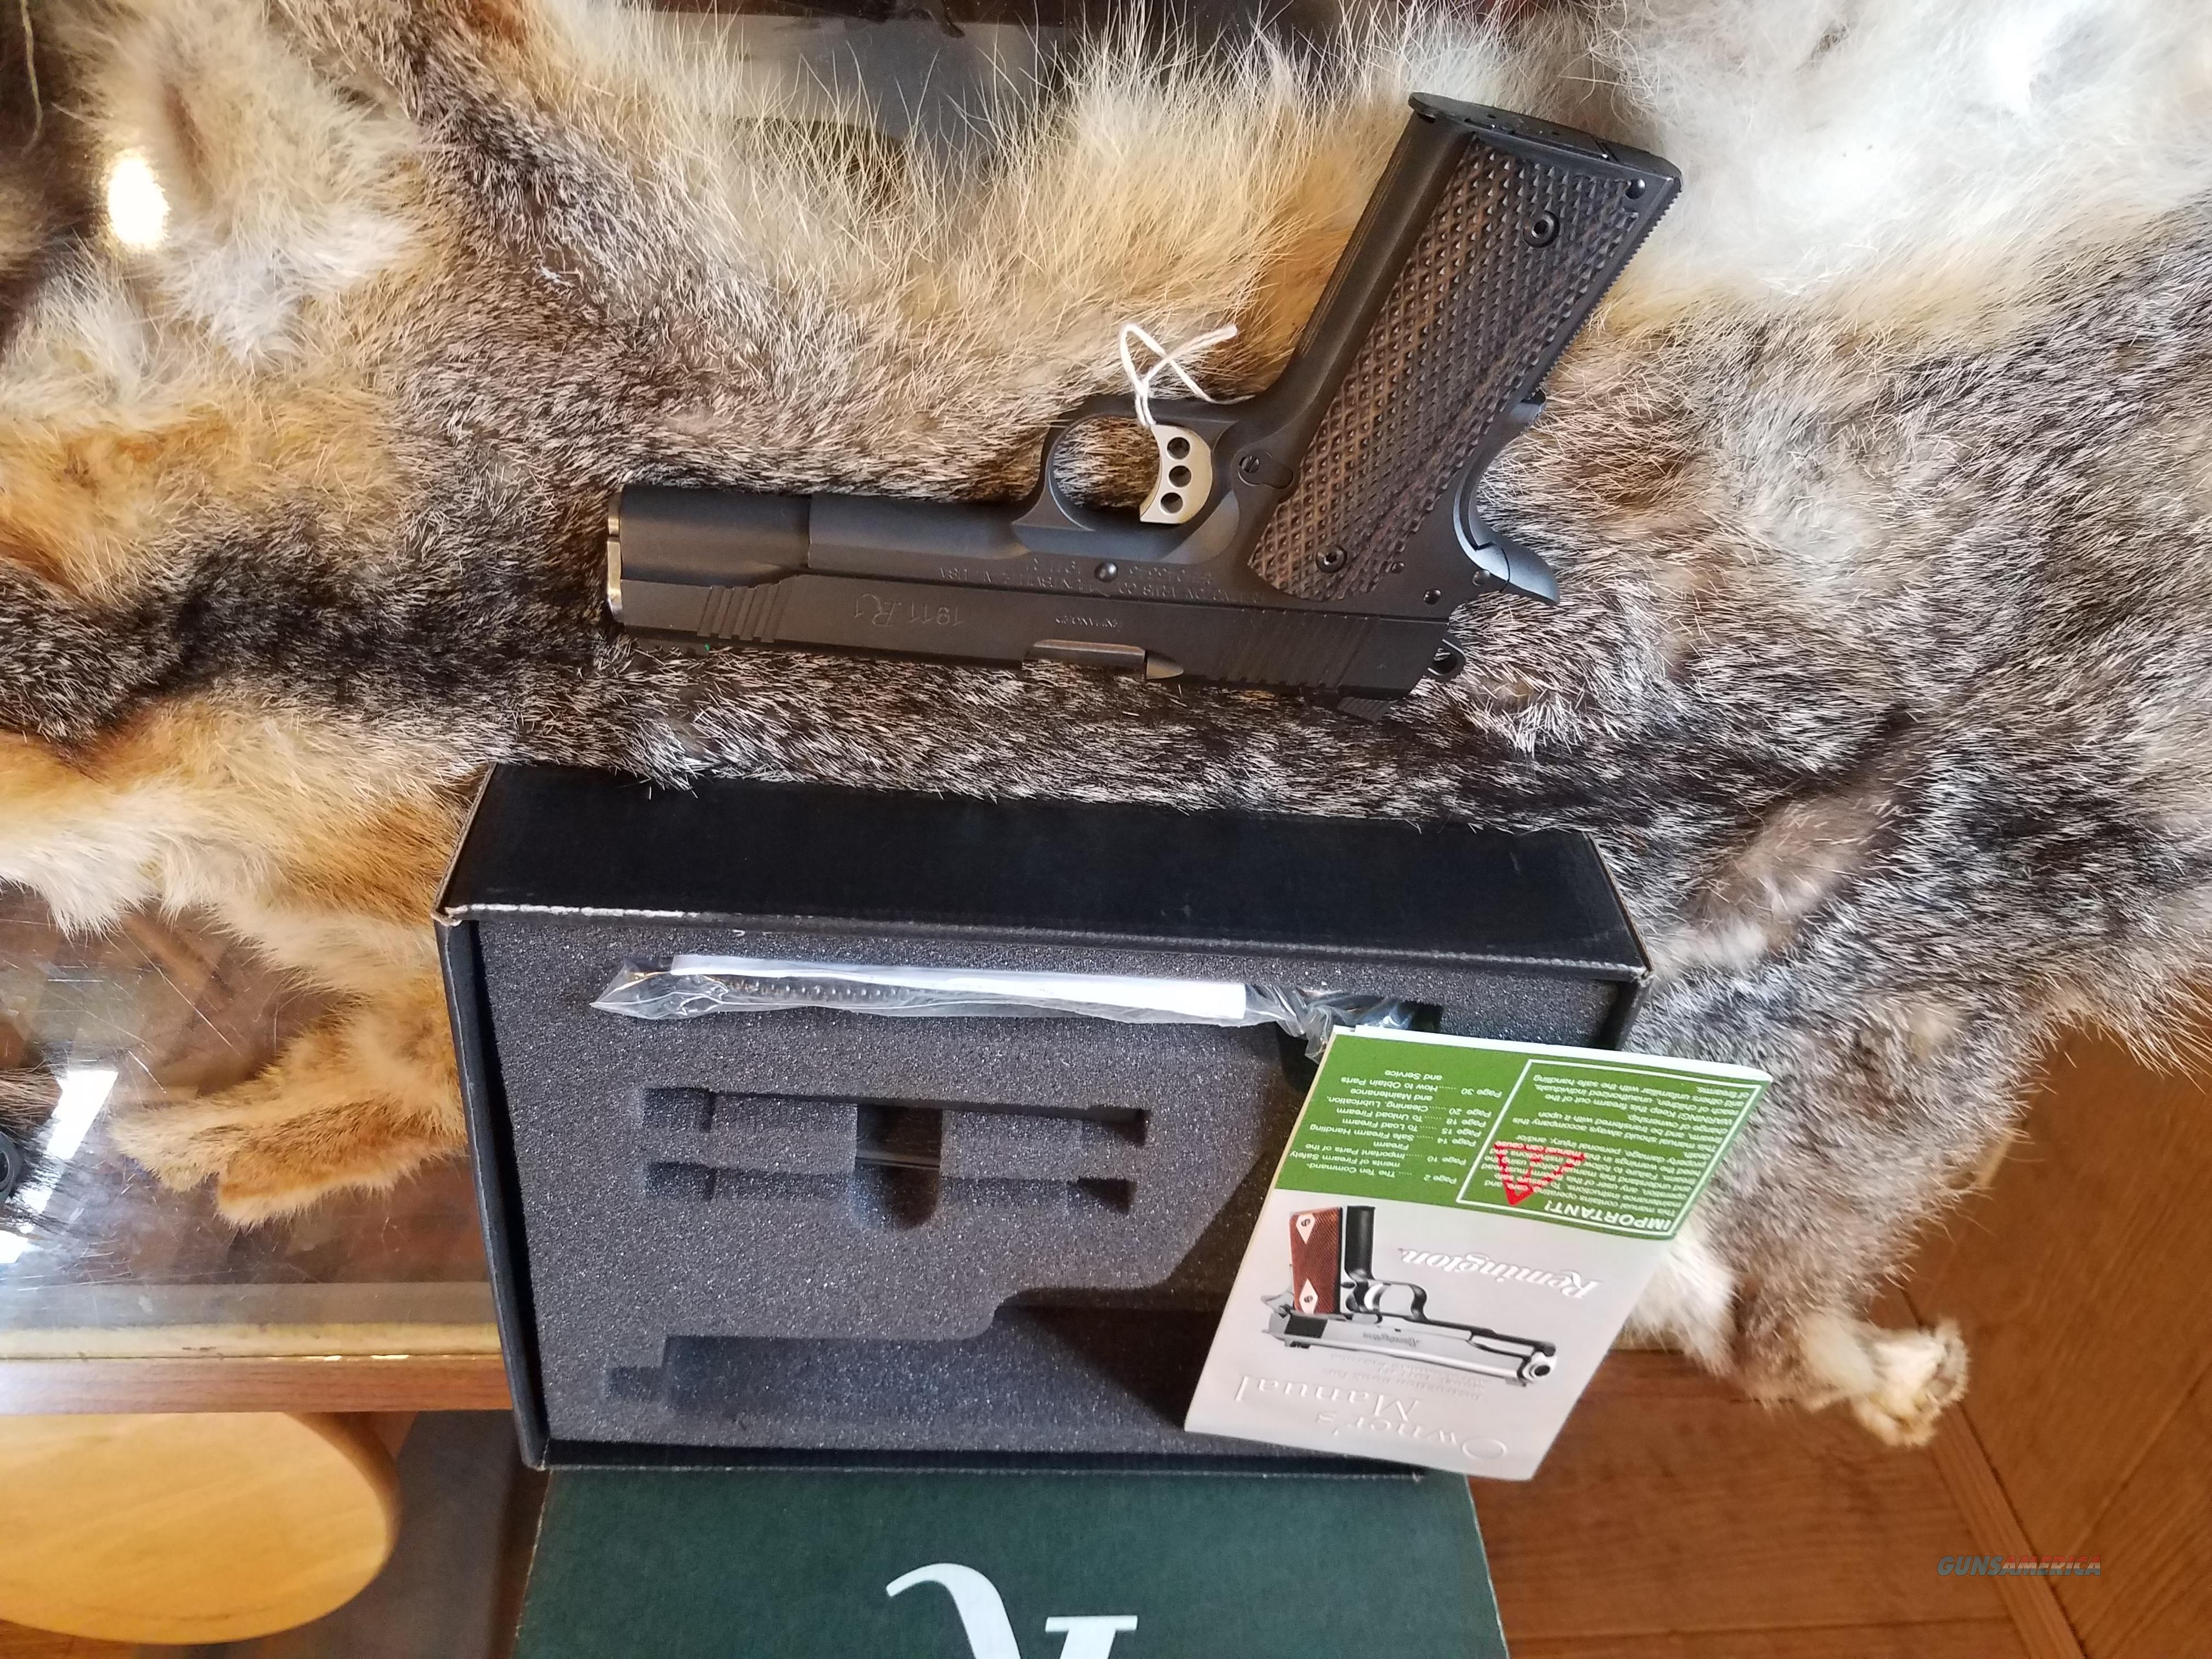 Remington R9 Enhanced   Guns > Pistols > Remington Pistols - Modern > 1911